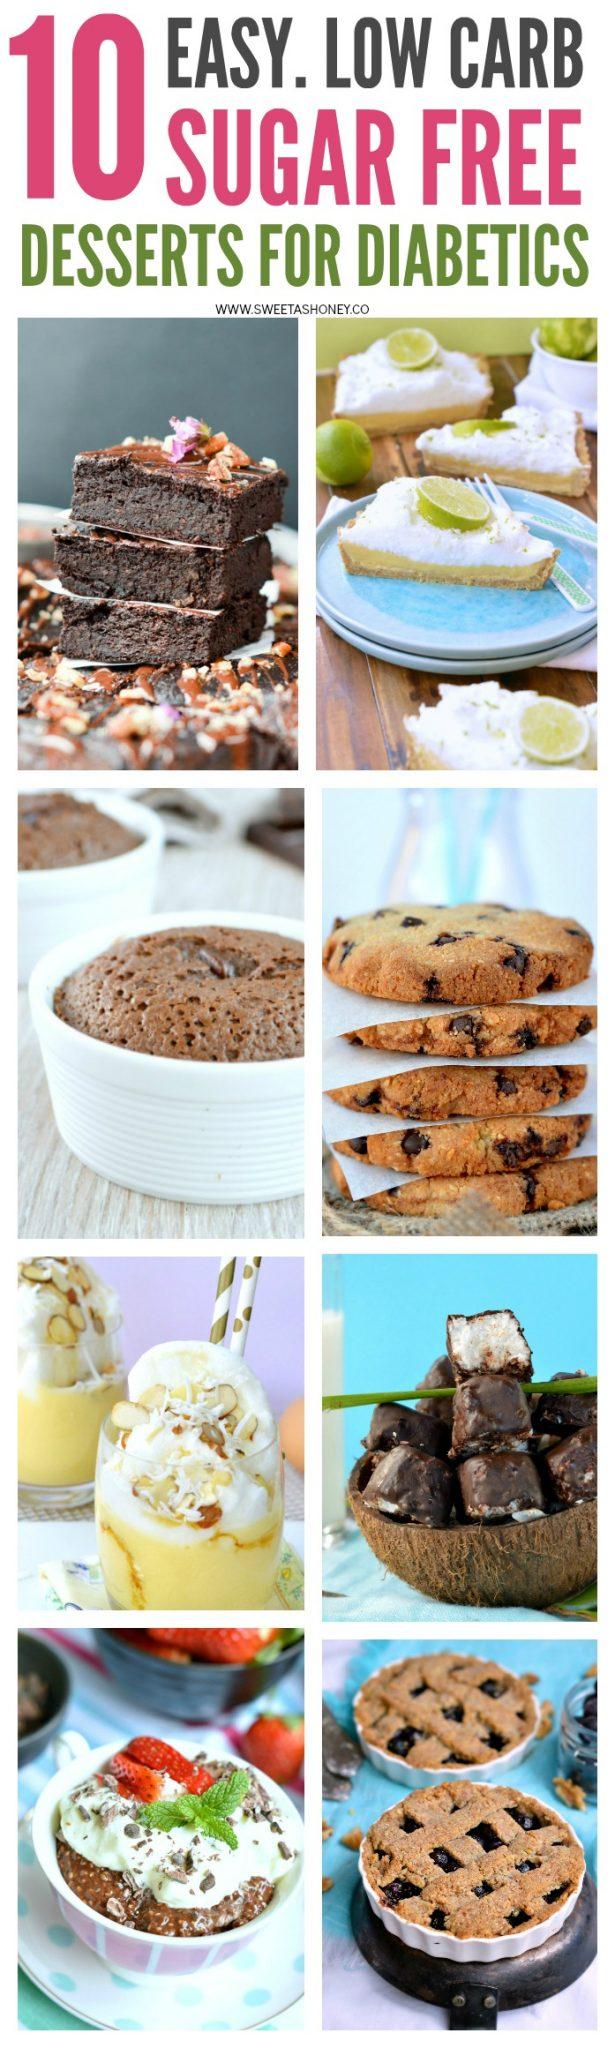 10 Sugar Free Desserts for diabetics Sweetashoney